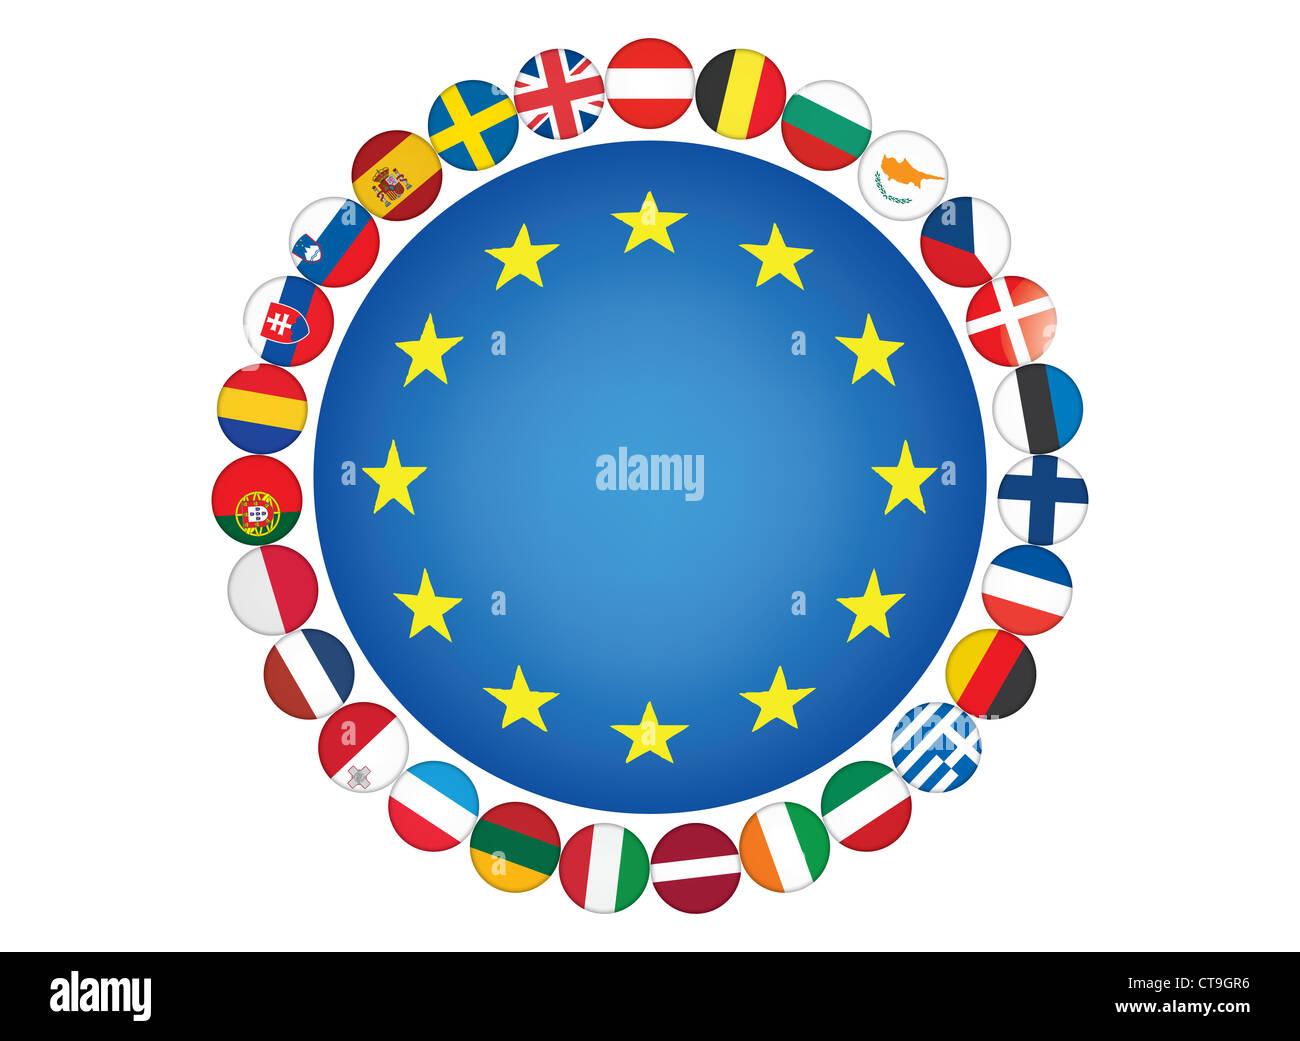 European Union flags illustration - Stock Image